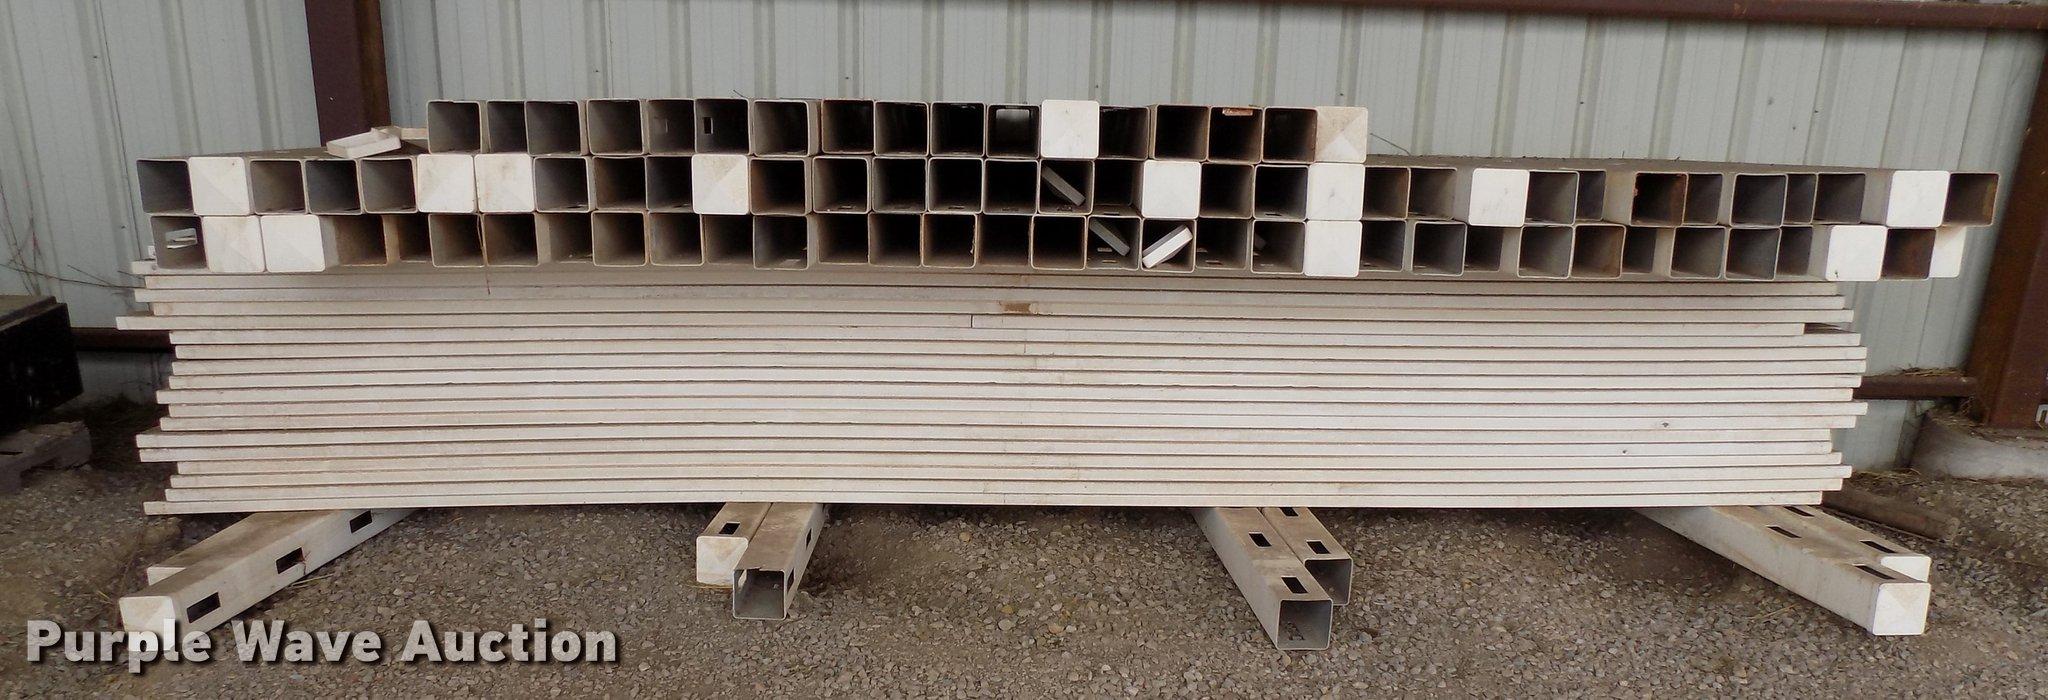 2,160' of poly fence | Item FQ9218 | Tuesday February 19 Gov